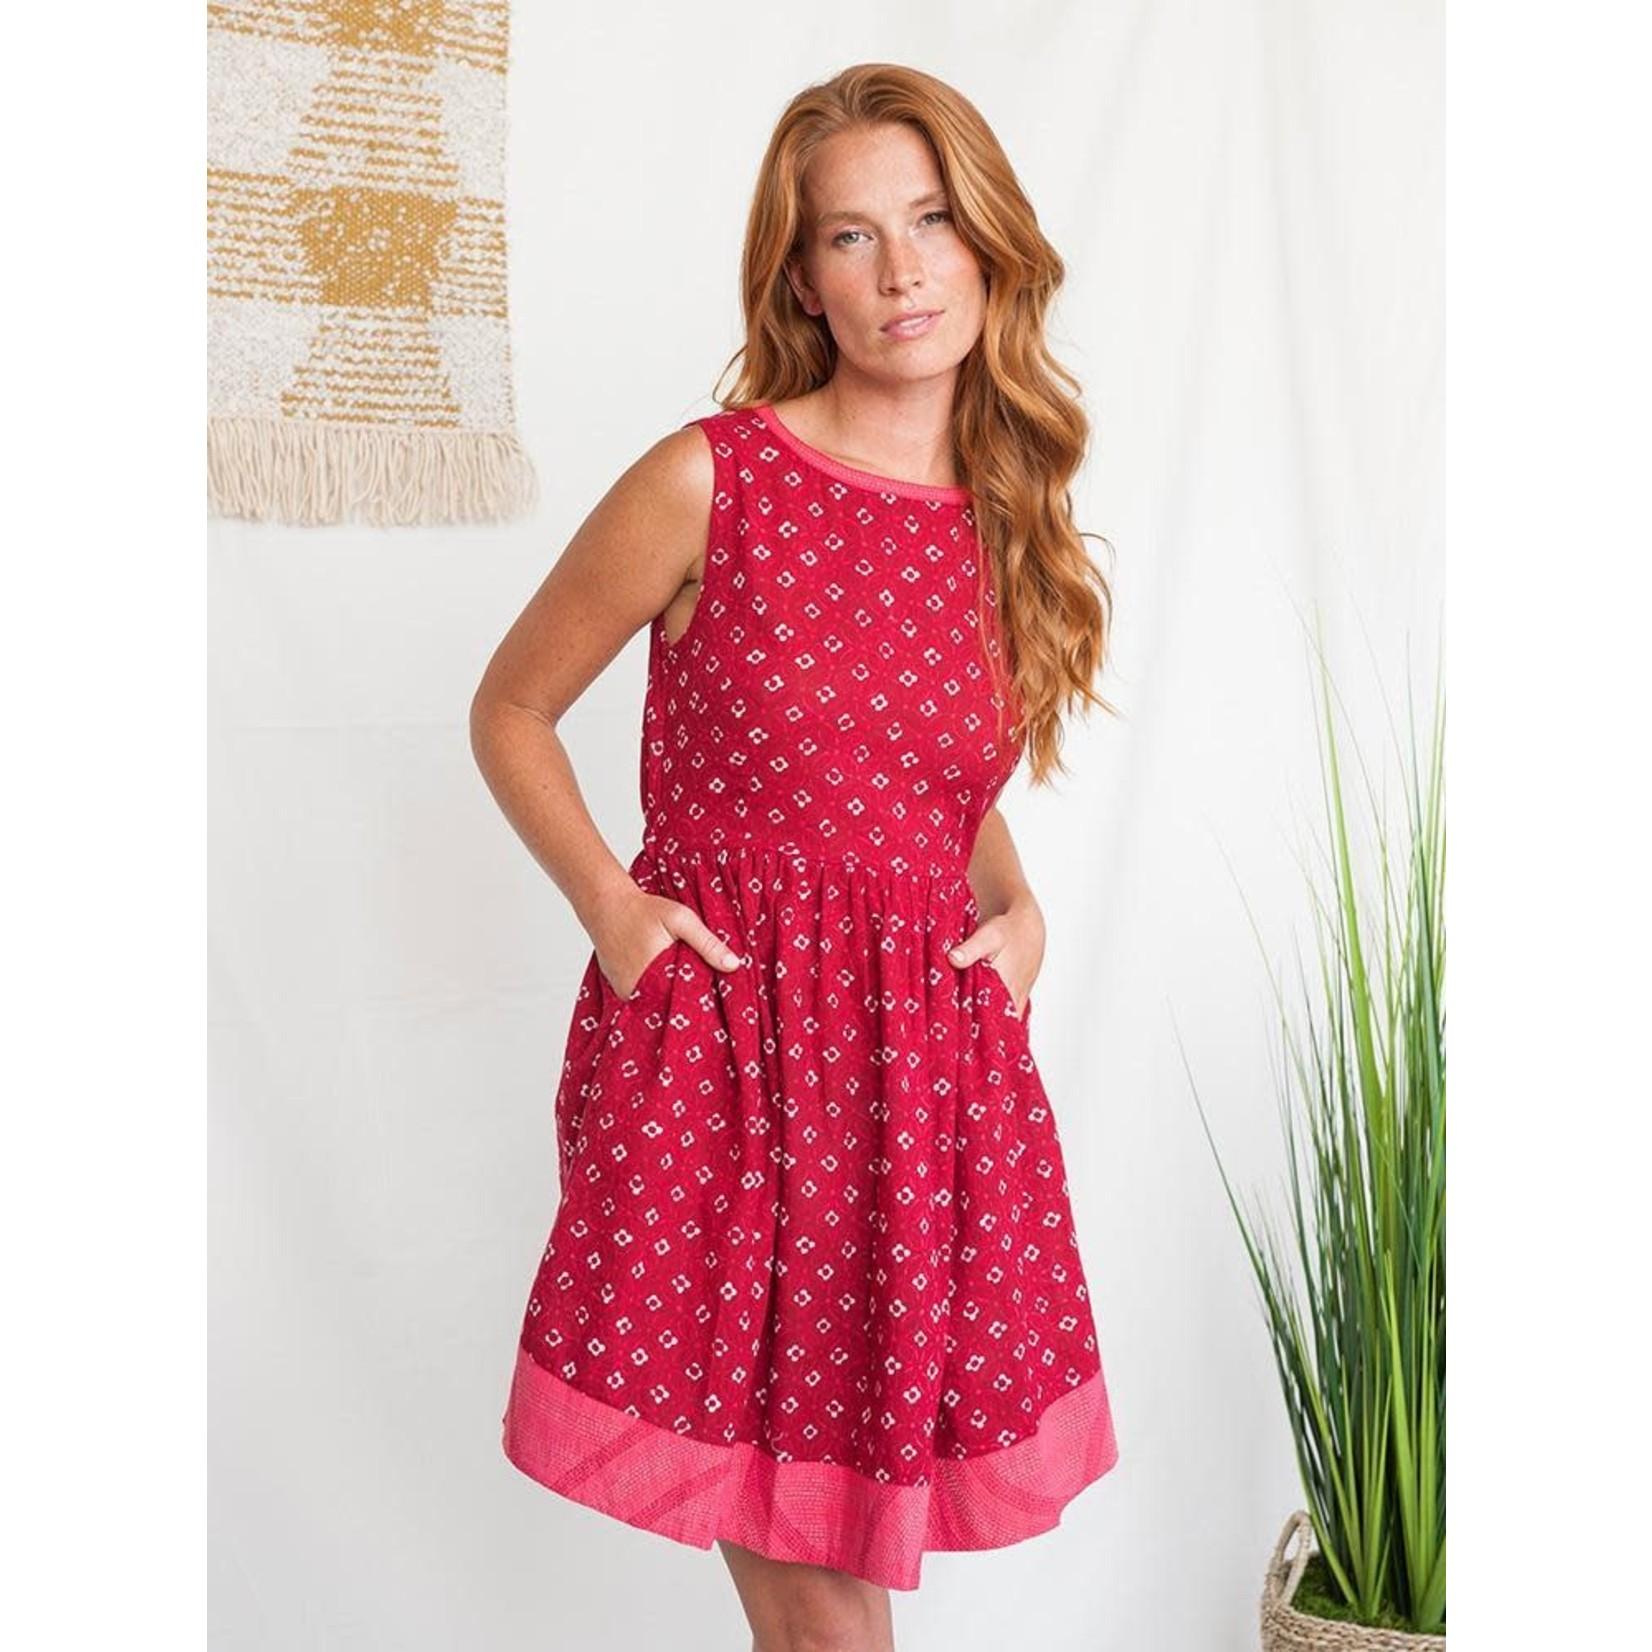 Mata Traders Tic Tac Toe Dress